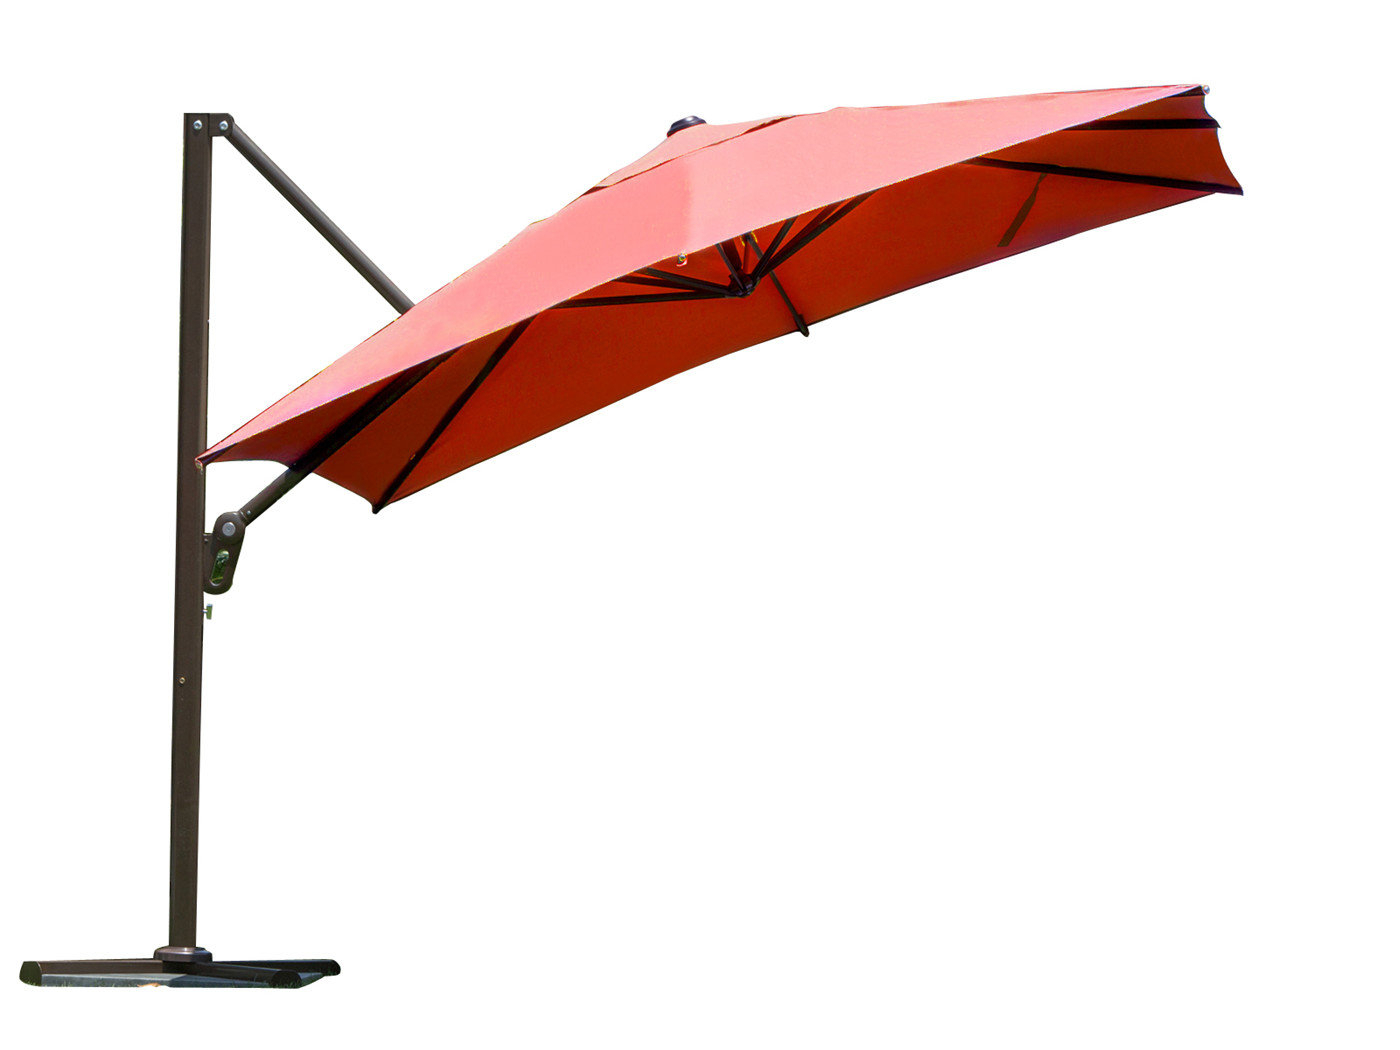 Most Current 9' Square Cantilever Umbrella In Lytham Cantilever Umbrellas (View 17 of 20)